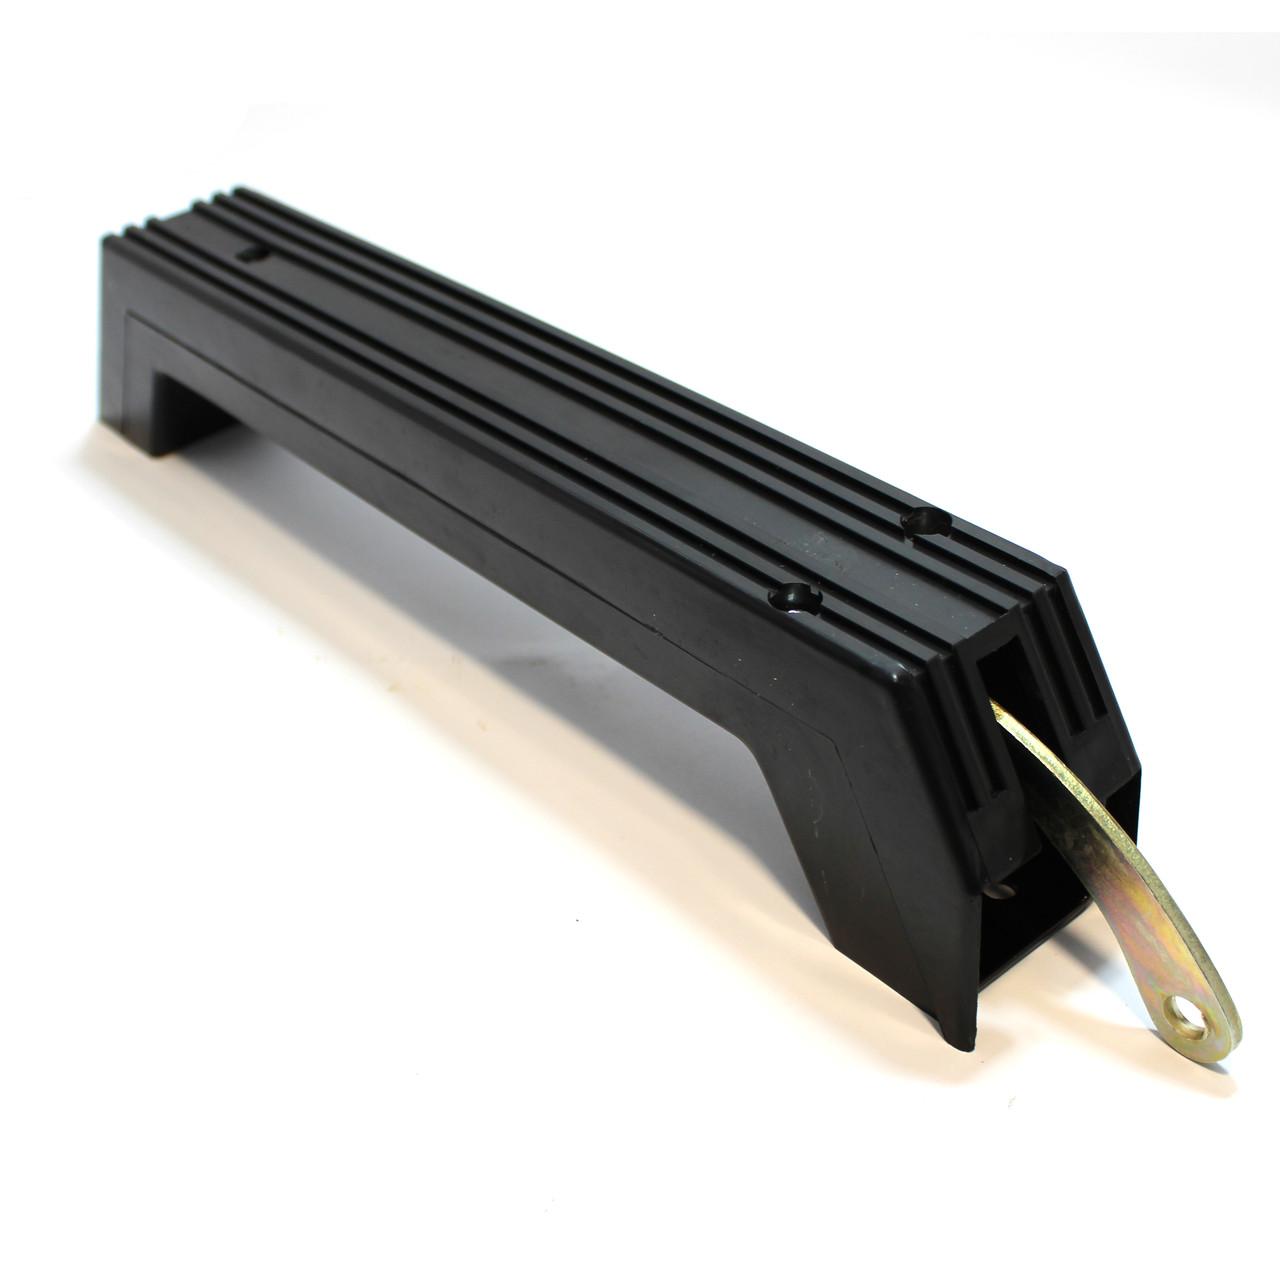 Ручка двери внутренняя МТЗ УК с фиксатором 80-6708600 (пр-во МТЗ)